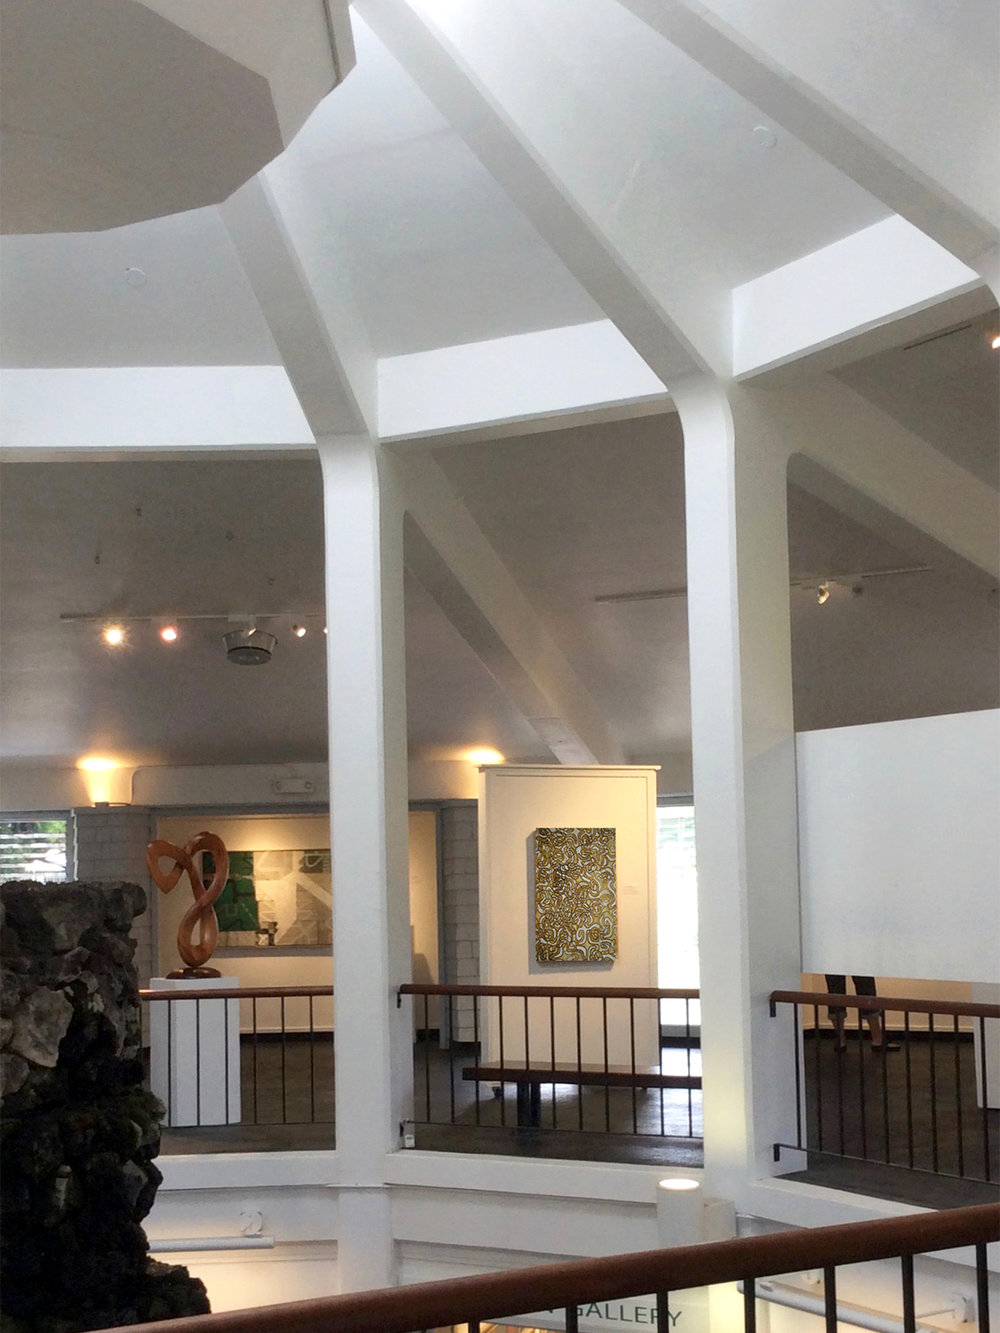 7th Biennial Juried Exhibition 2017 Wailoa Center, Hilo Hawai'i Juror - Hiroki Morinoue